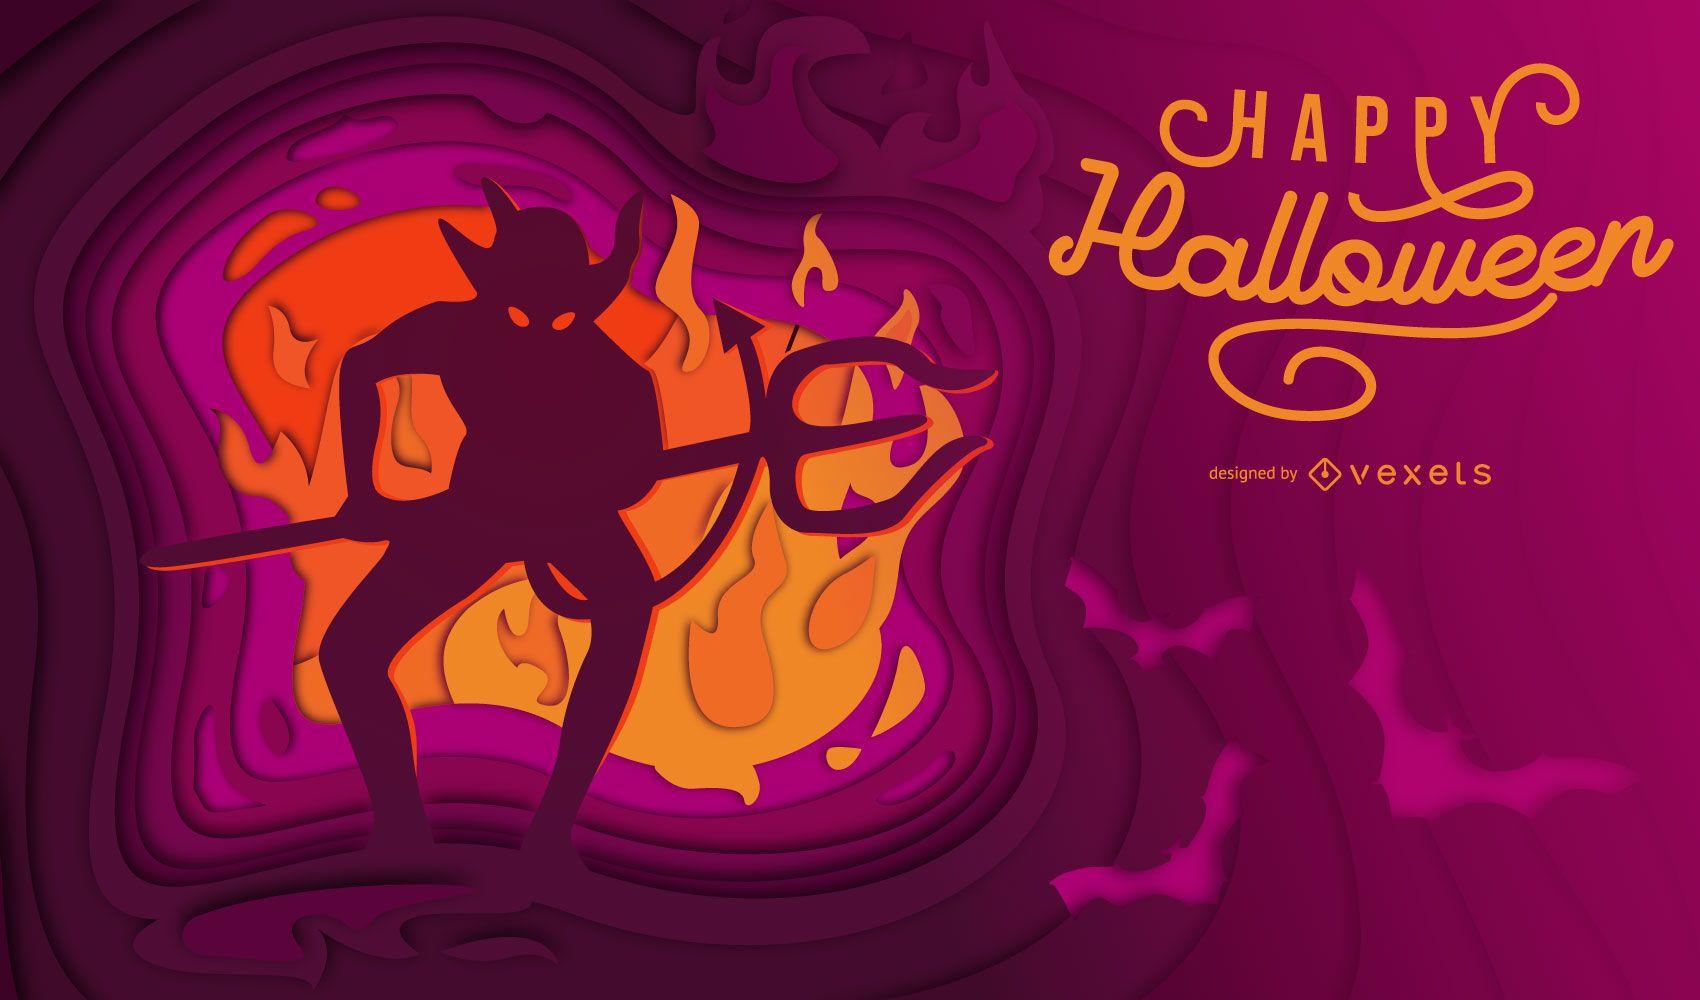 Devil papercut halloween illustration